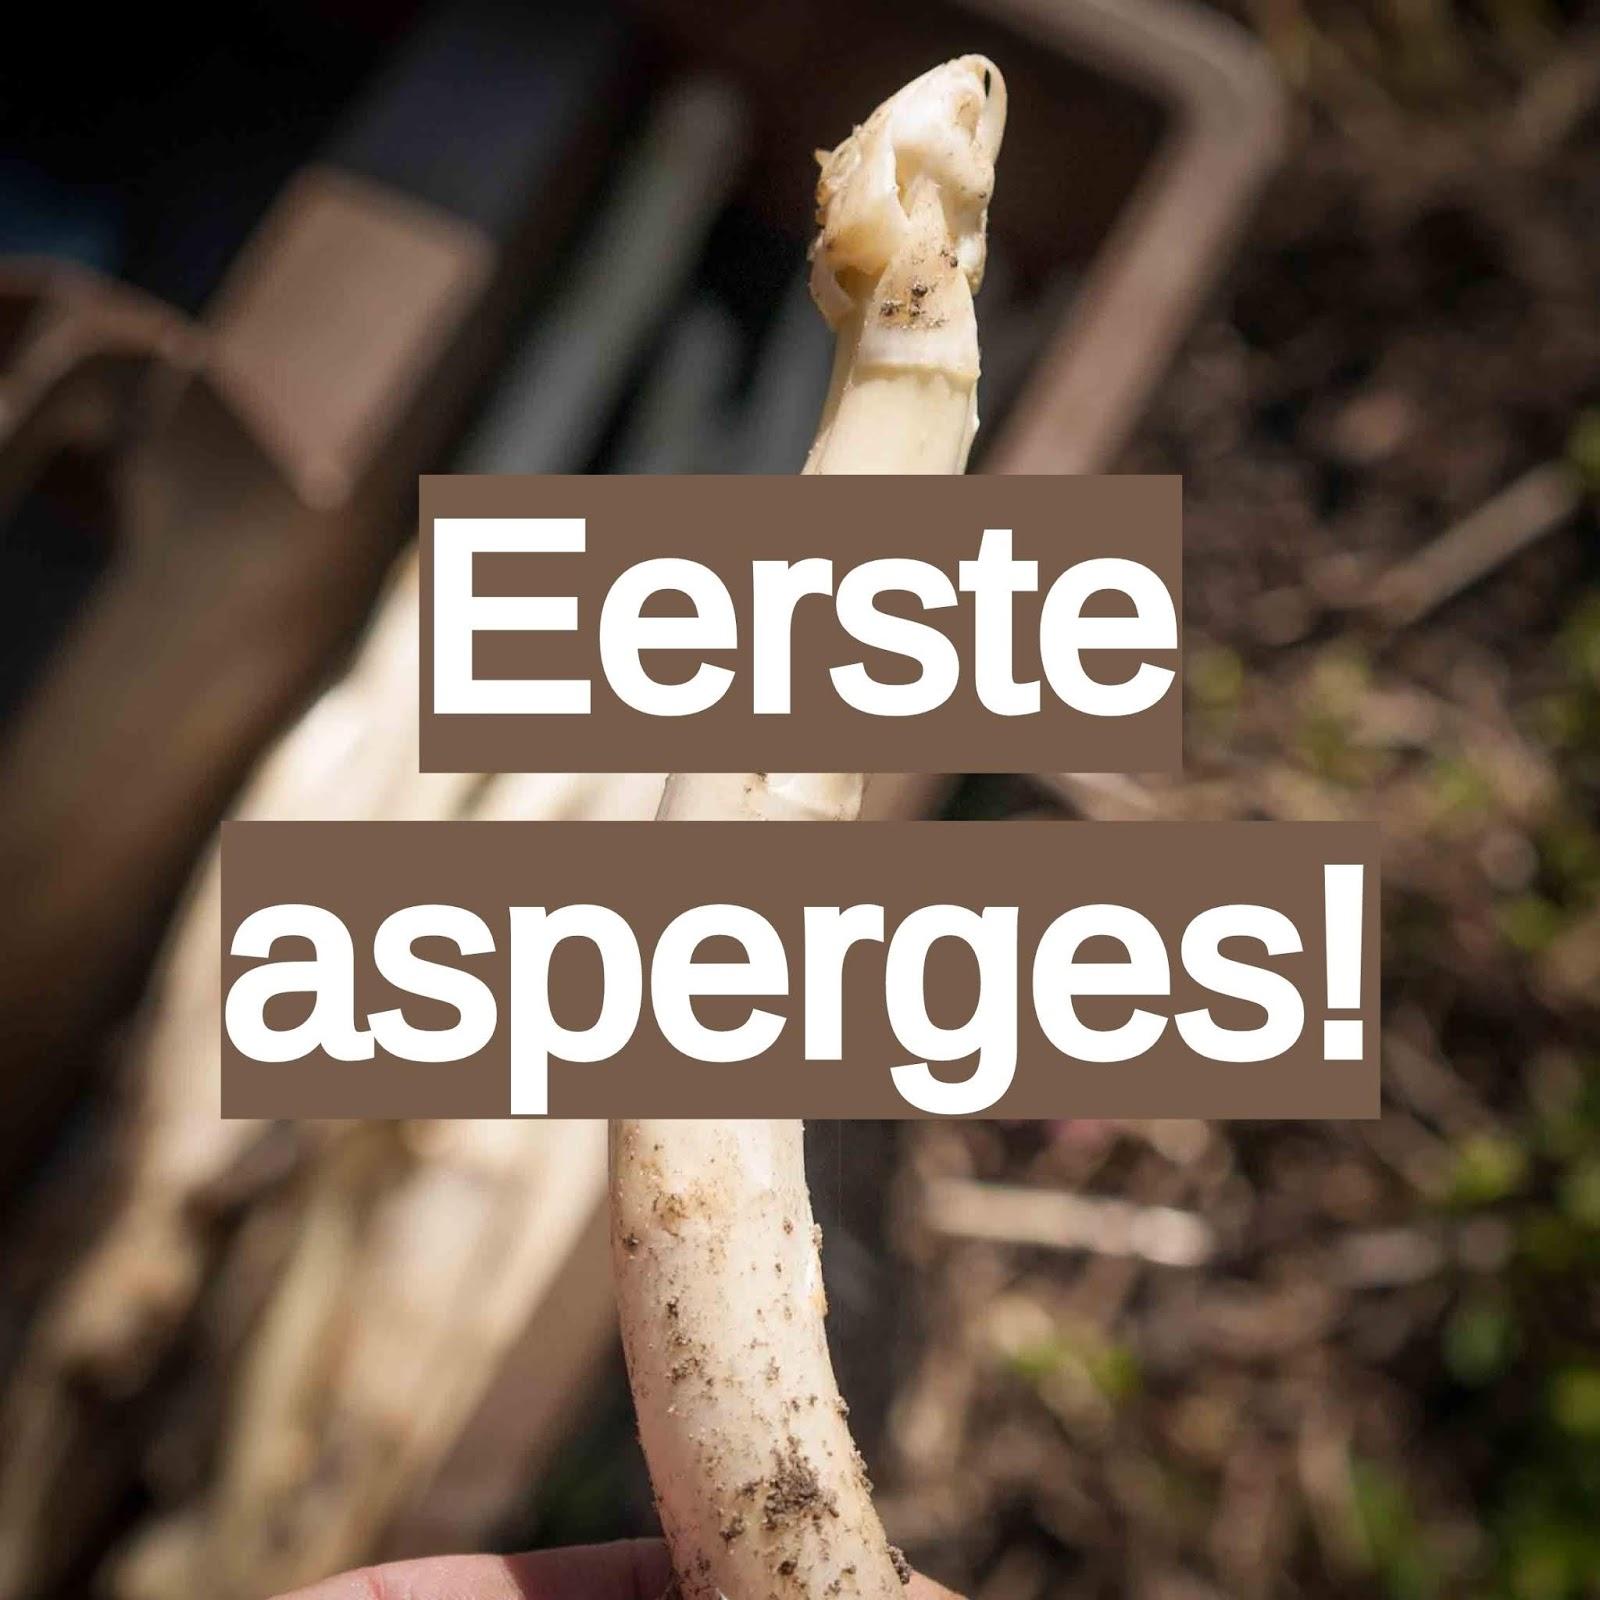 asperges moestuin volkstuin